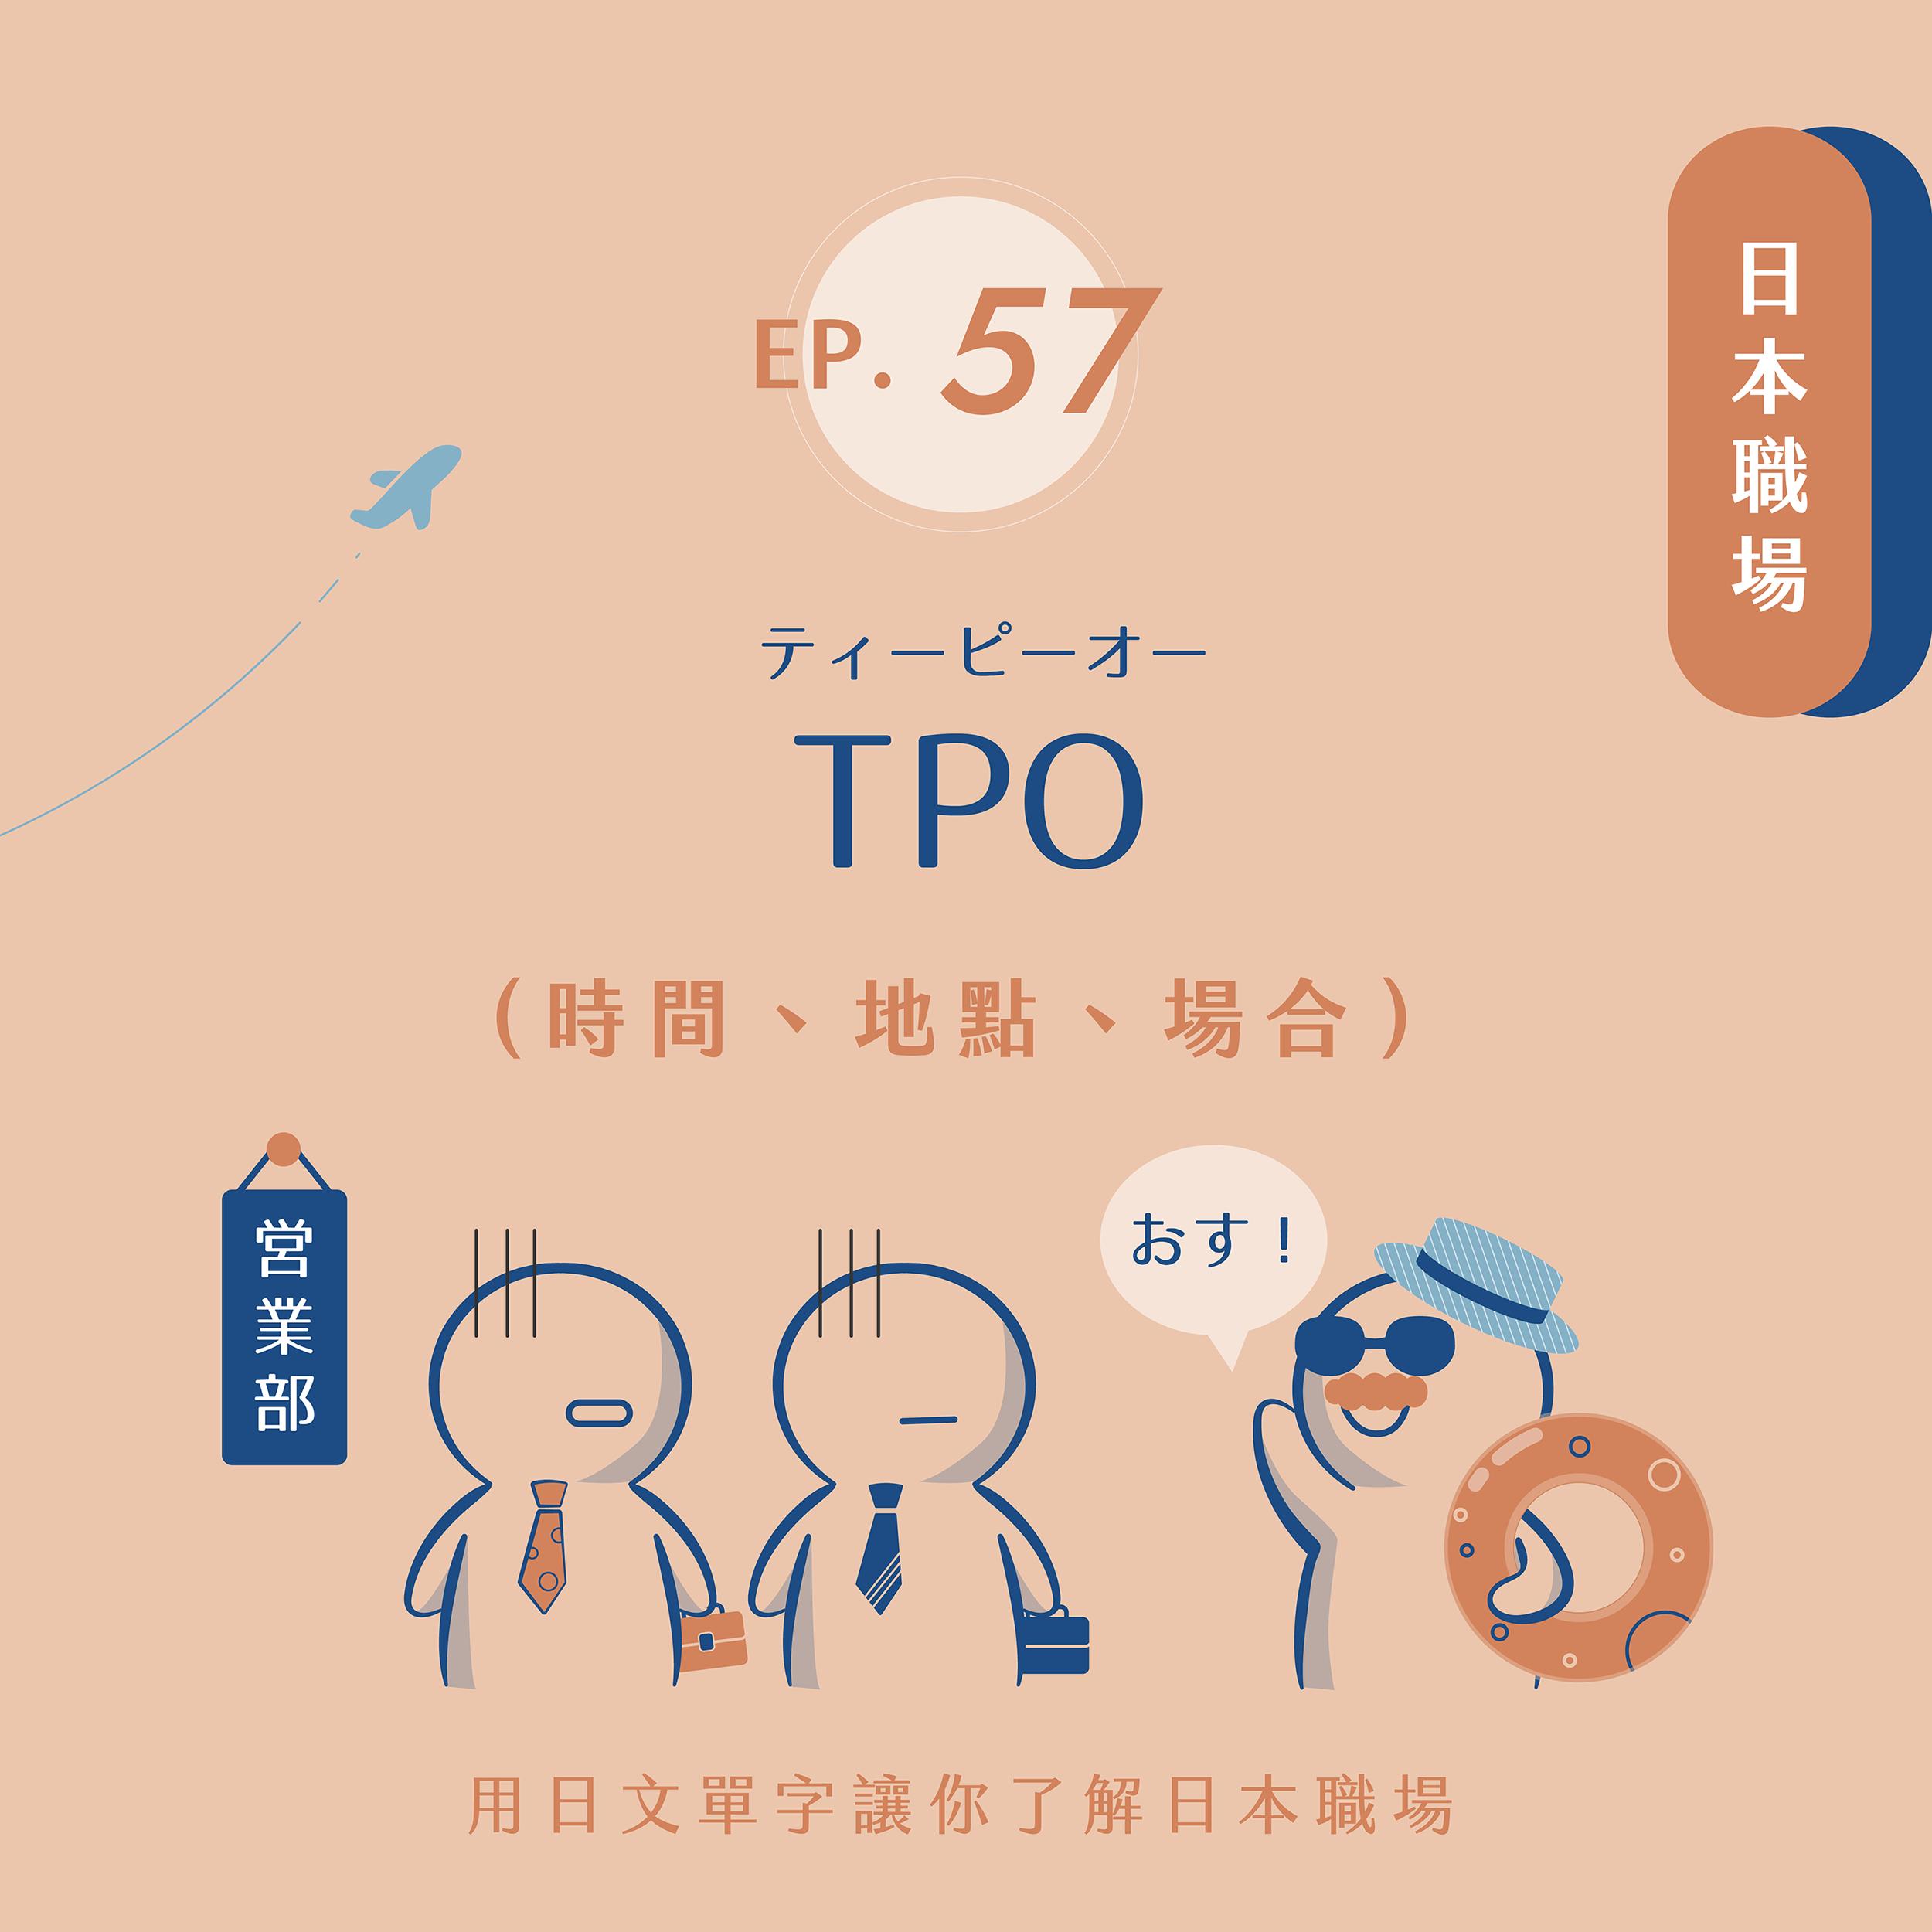 EP57【日本職場】TPO(時間、地點、場合)